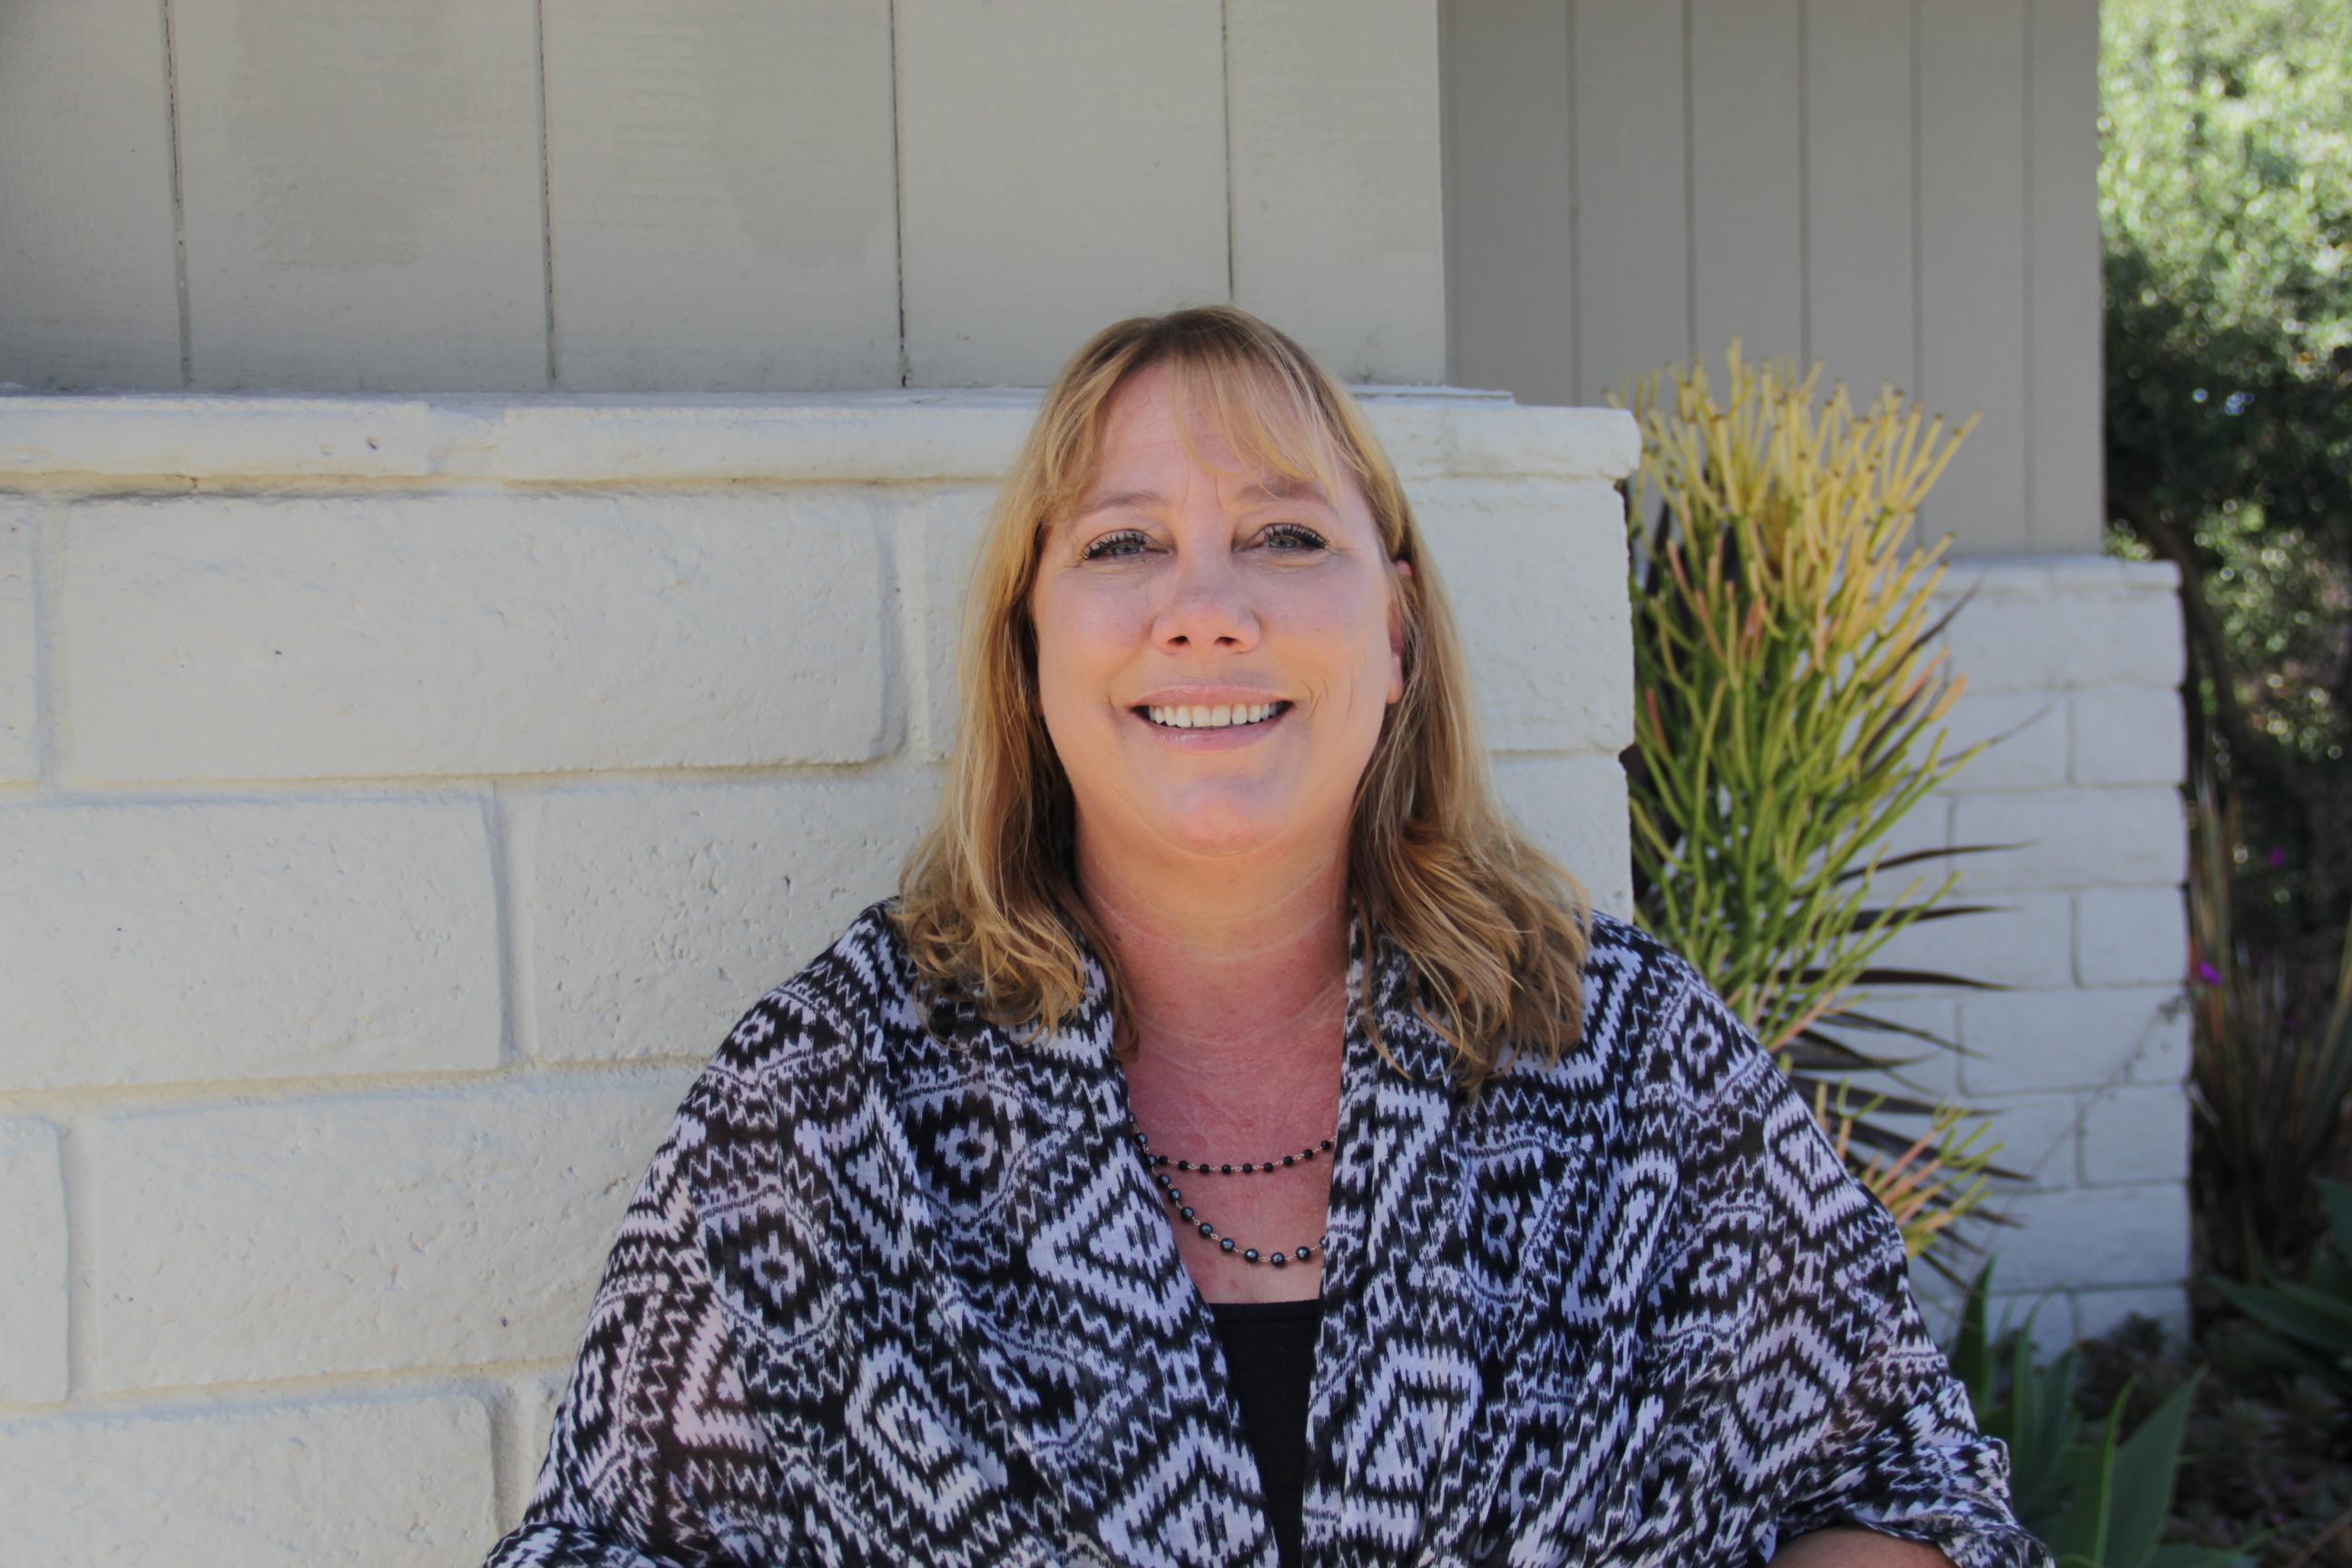 Traci Kelly, new to Picket Fence Media